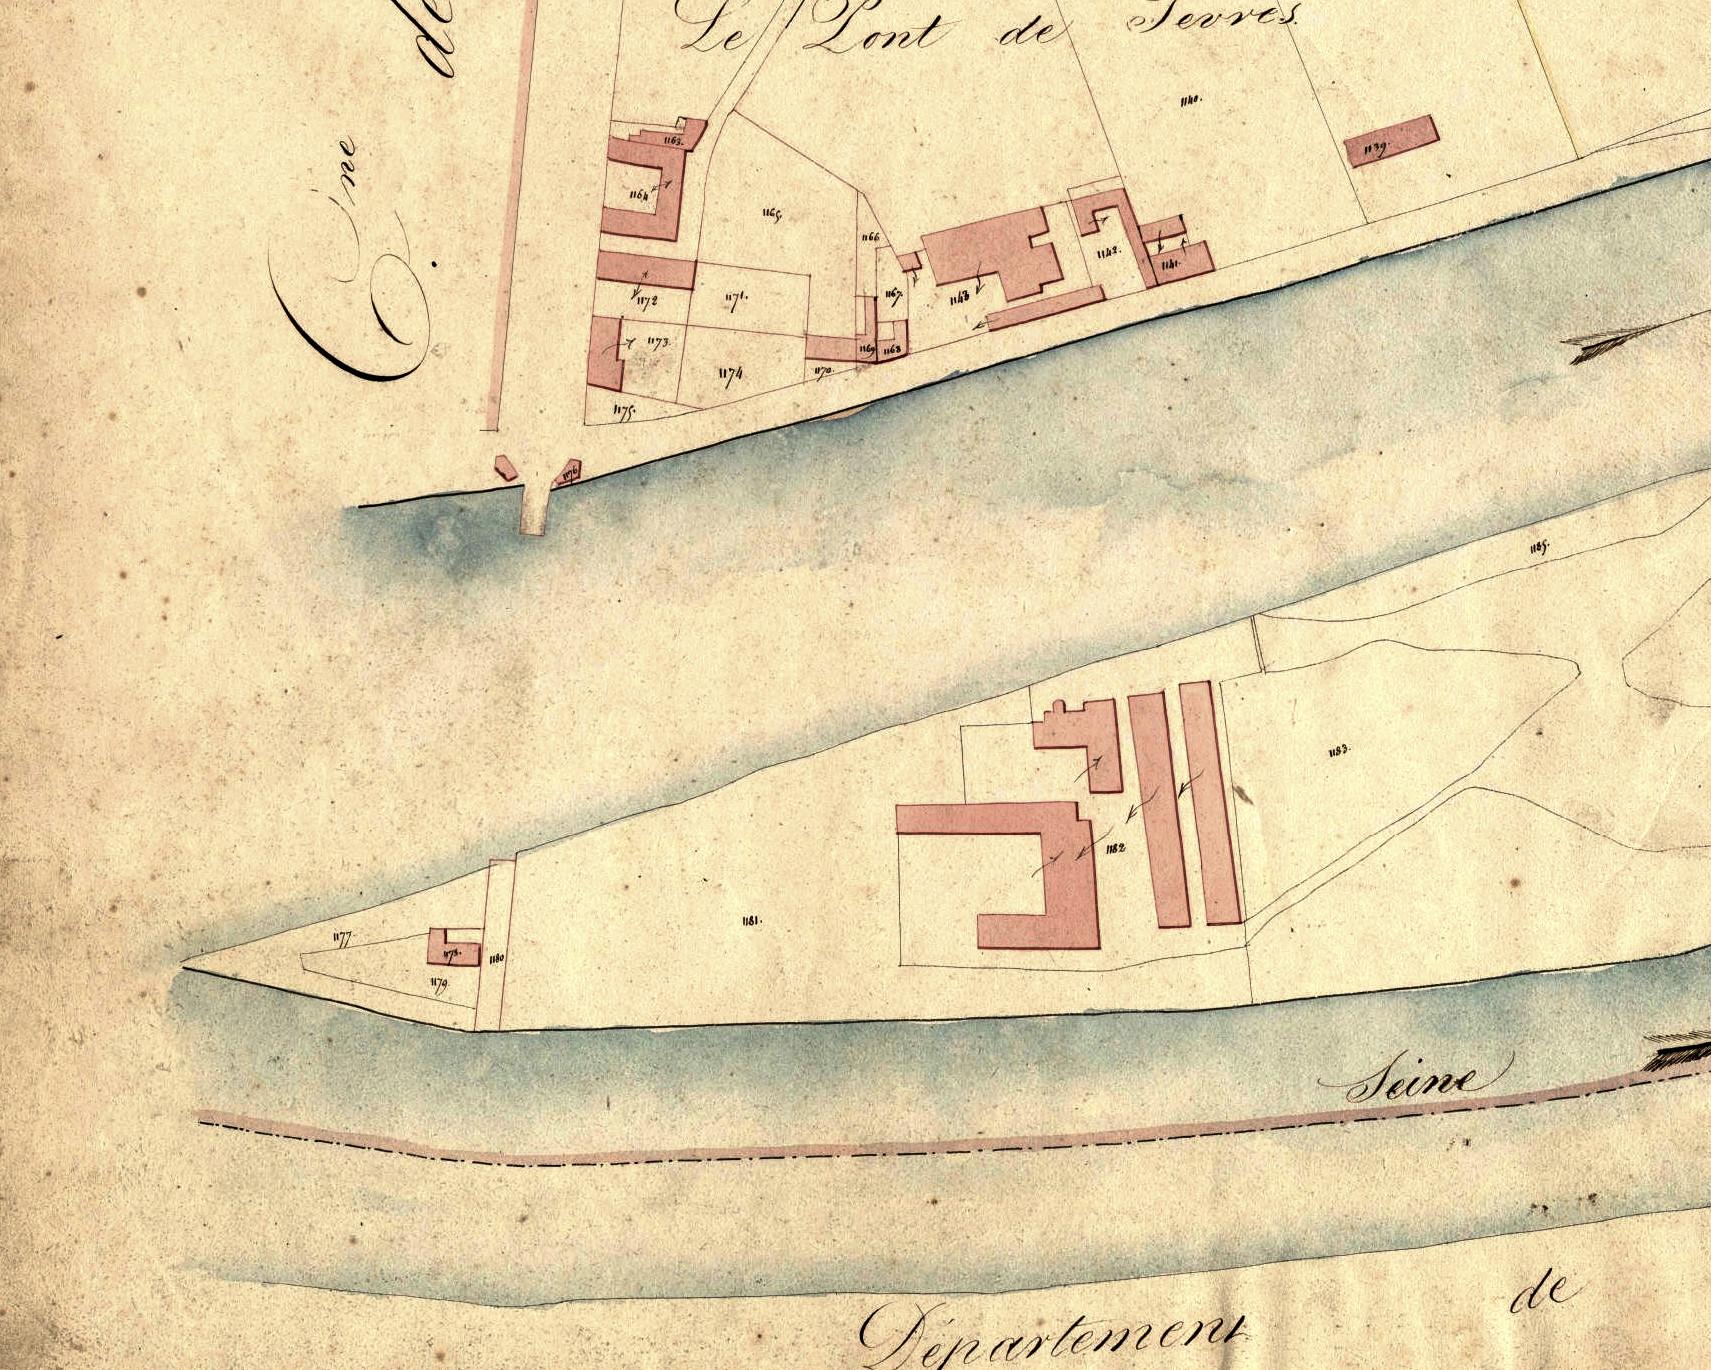 La manufacture de l'île Seguin cadastre 1823